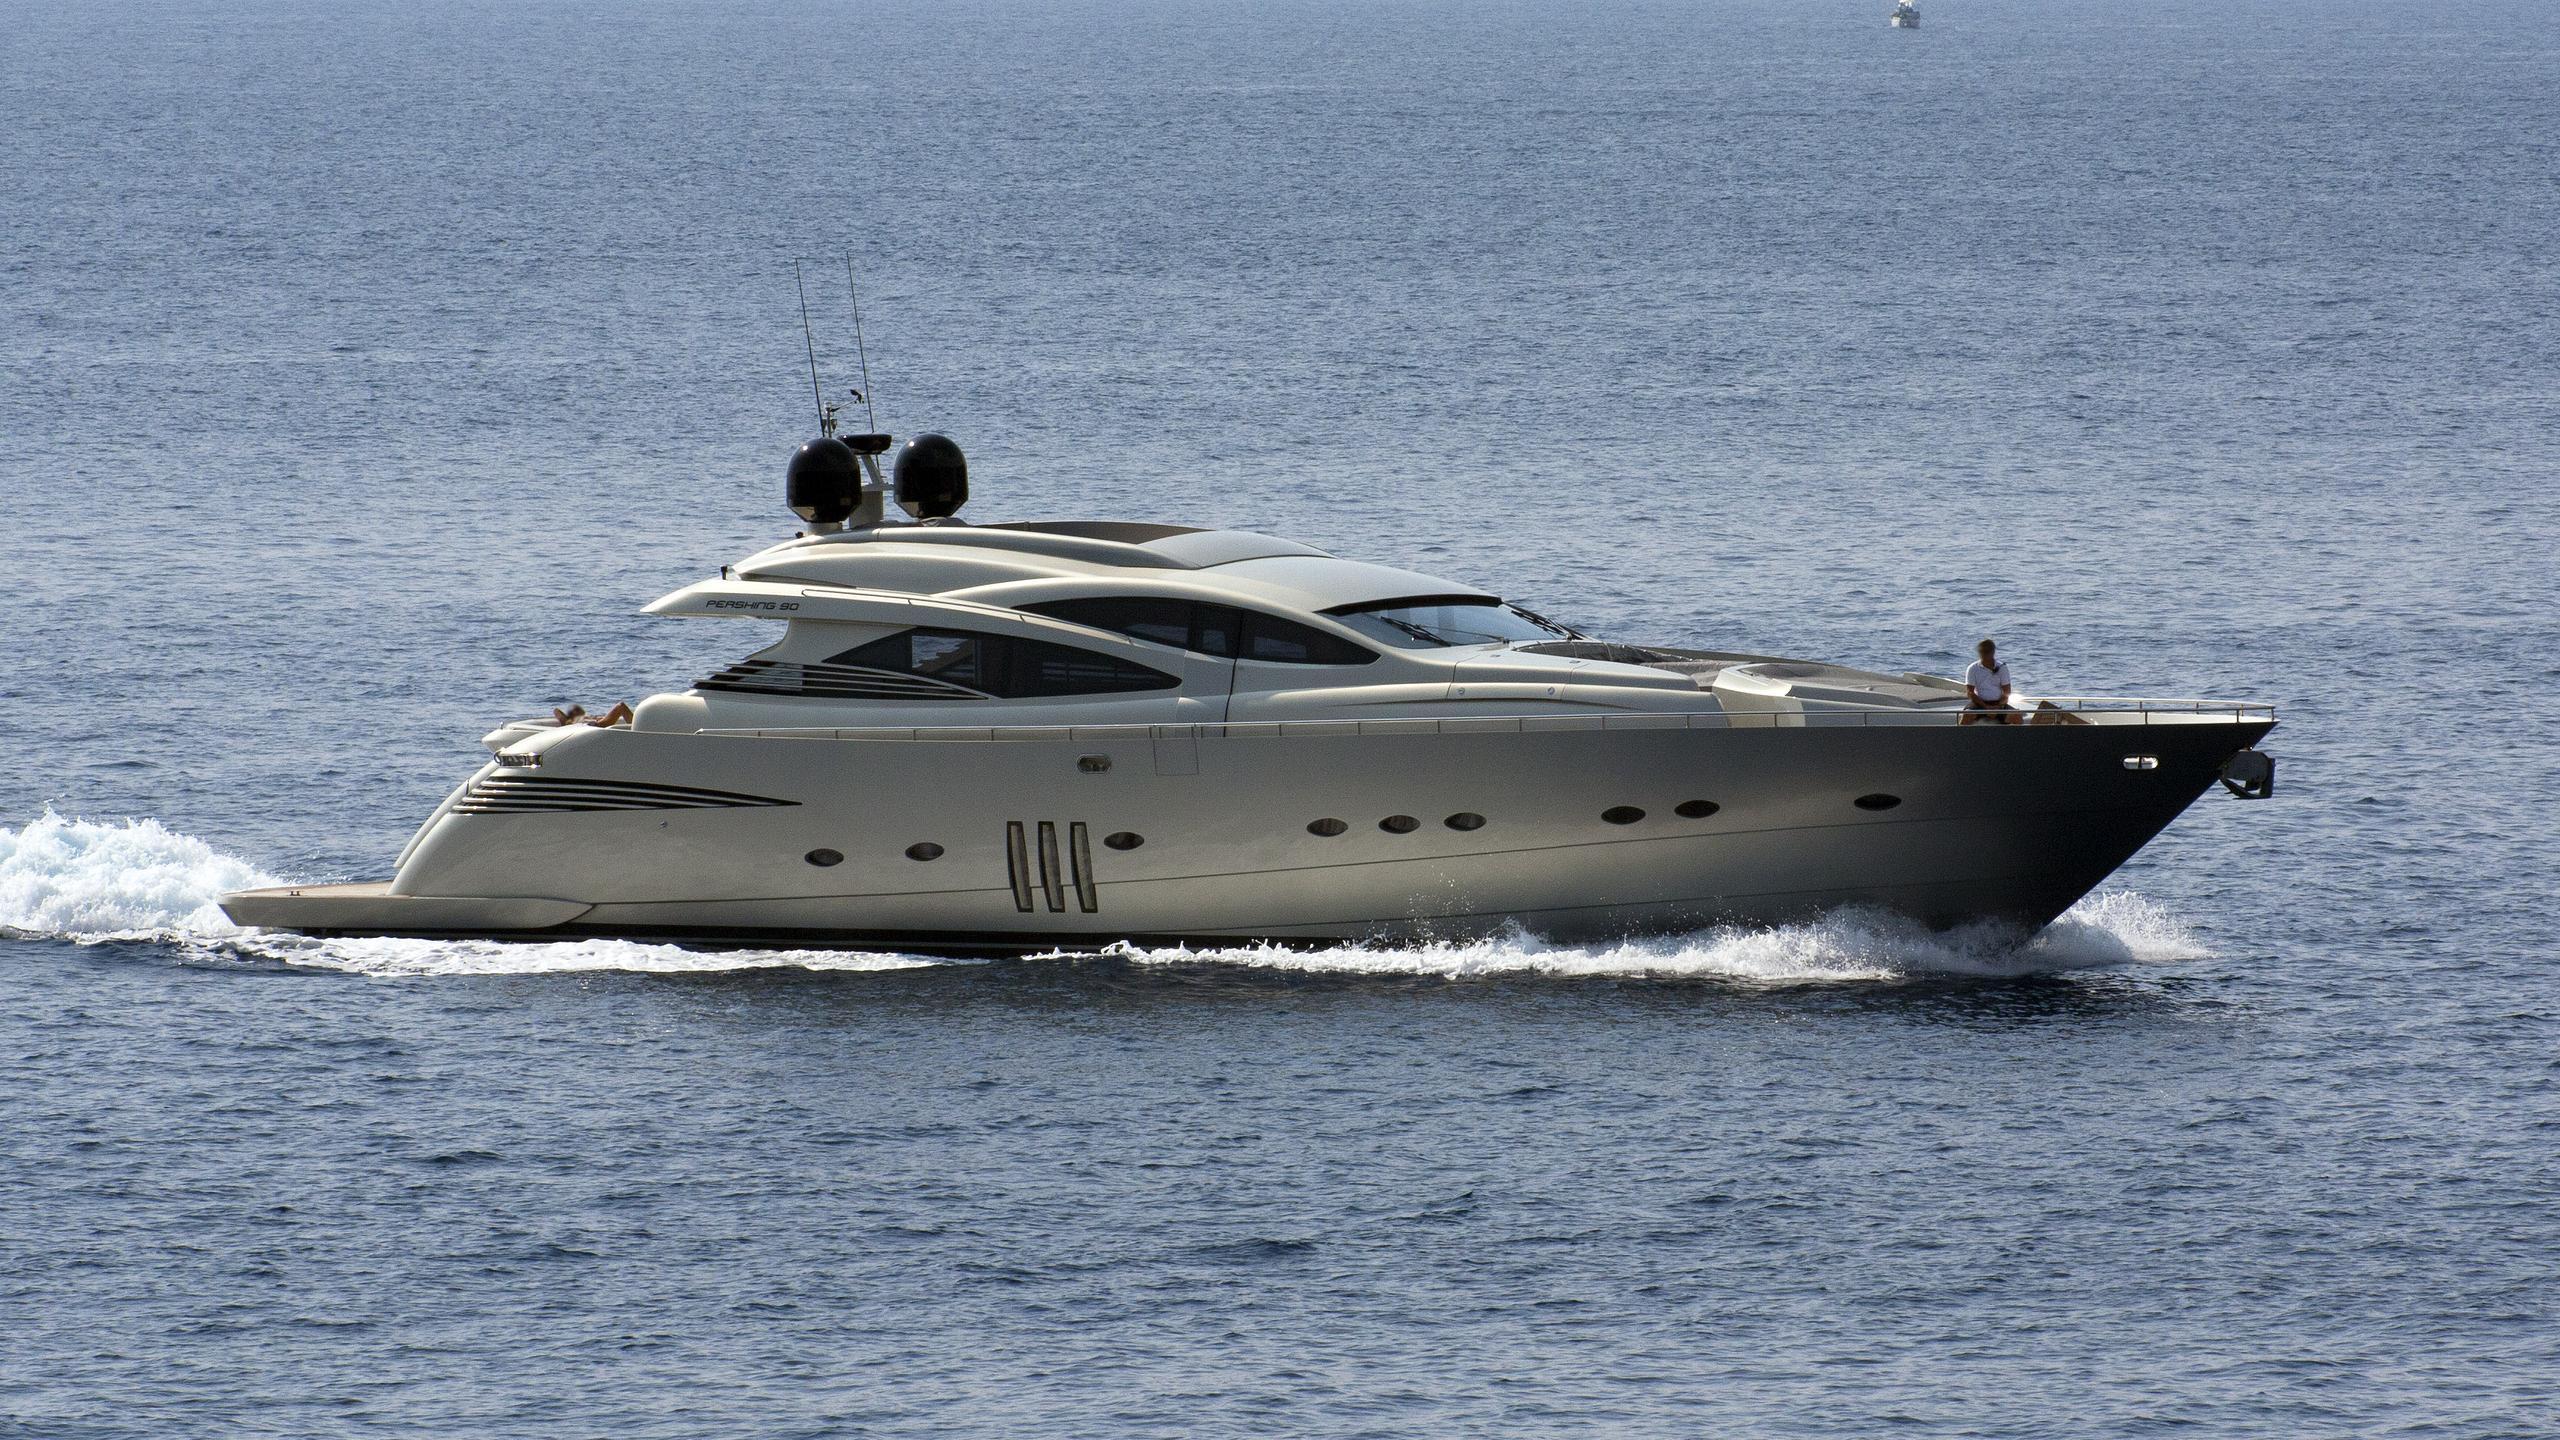 le-caprice-iii-motor-yacht-pershing-90-2009-27m-cruising